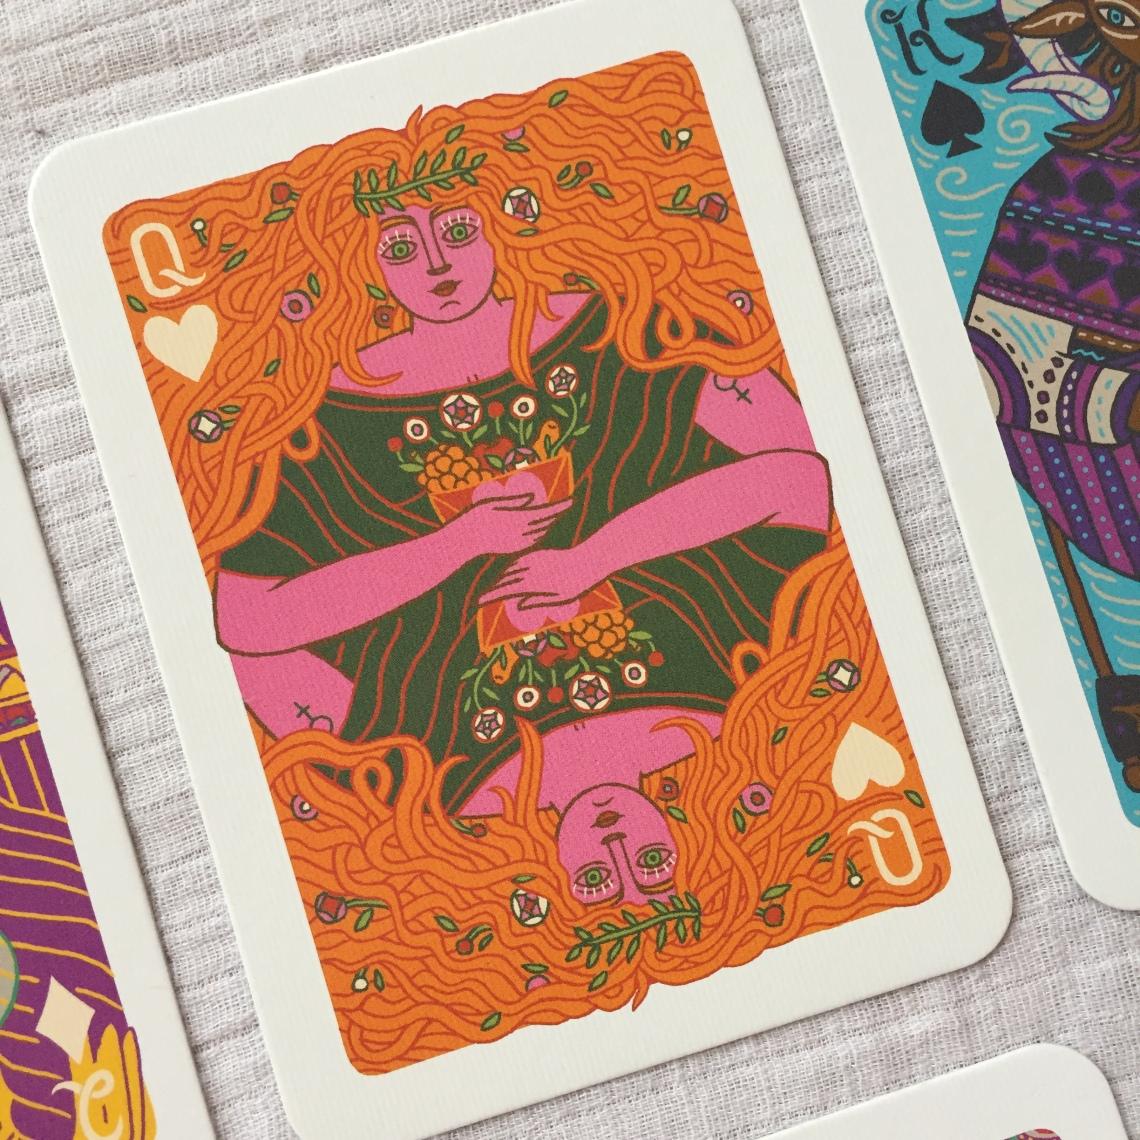 Queen of Hearts The Illuminated Tarot